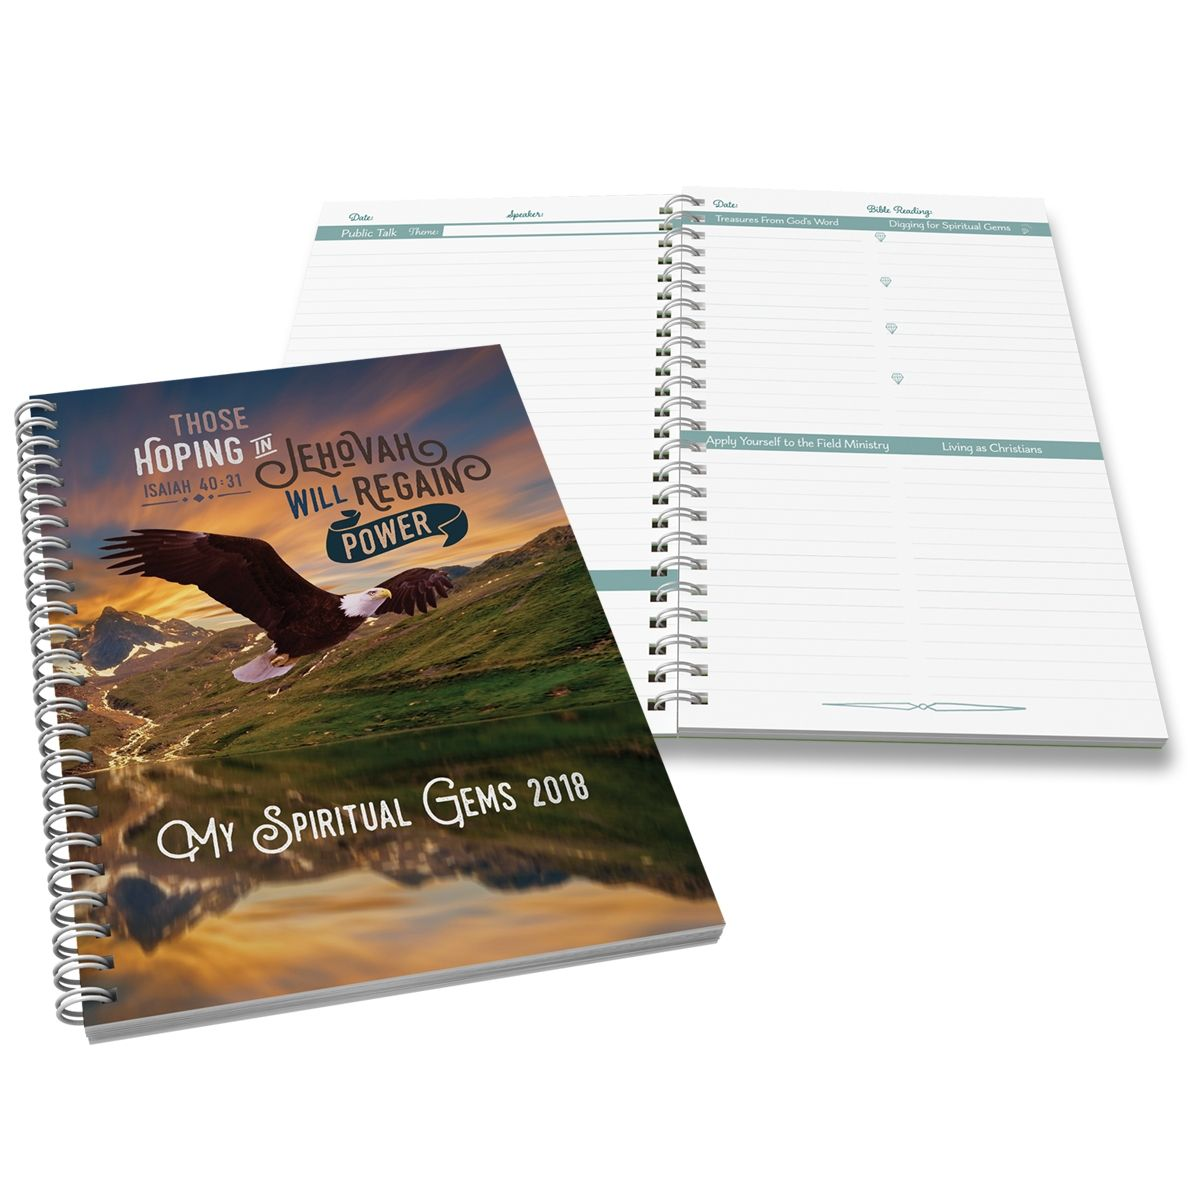 Workbooks spiritual gifts workbook : My Spiritual Gems